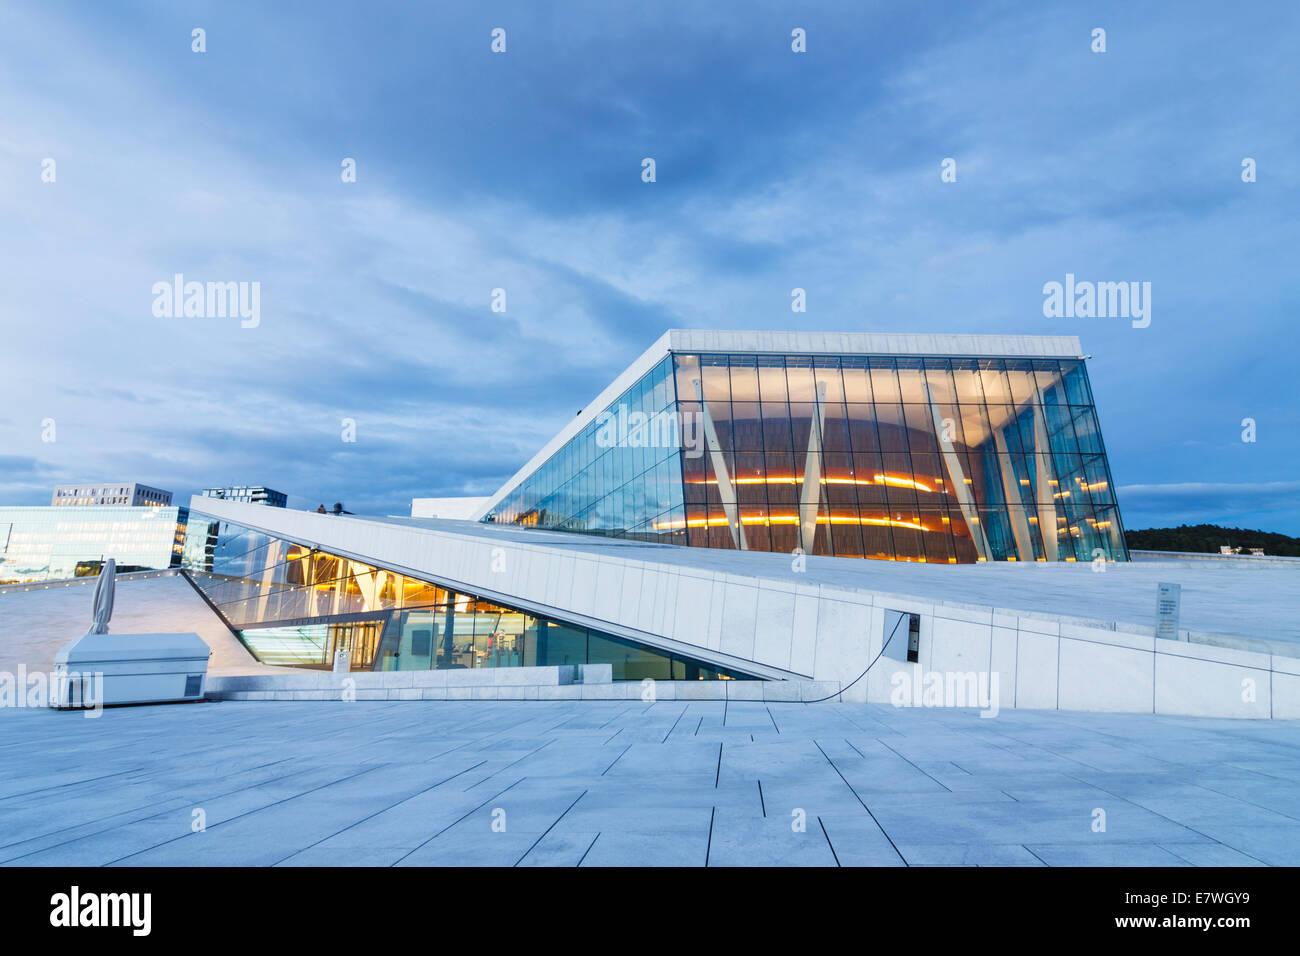 Opera Hall at night, Oslo, Norway - Stock Image